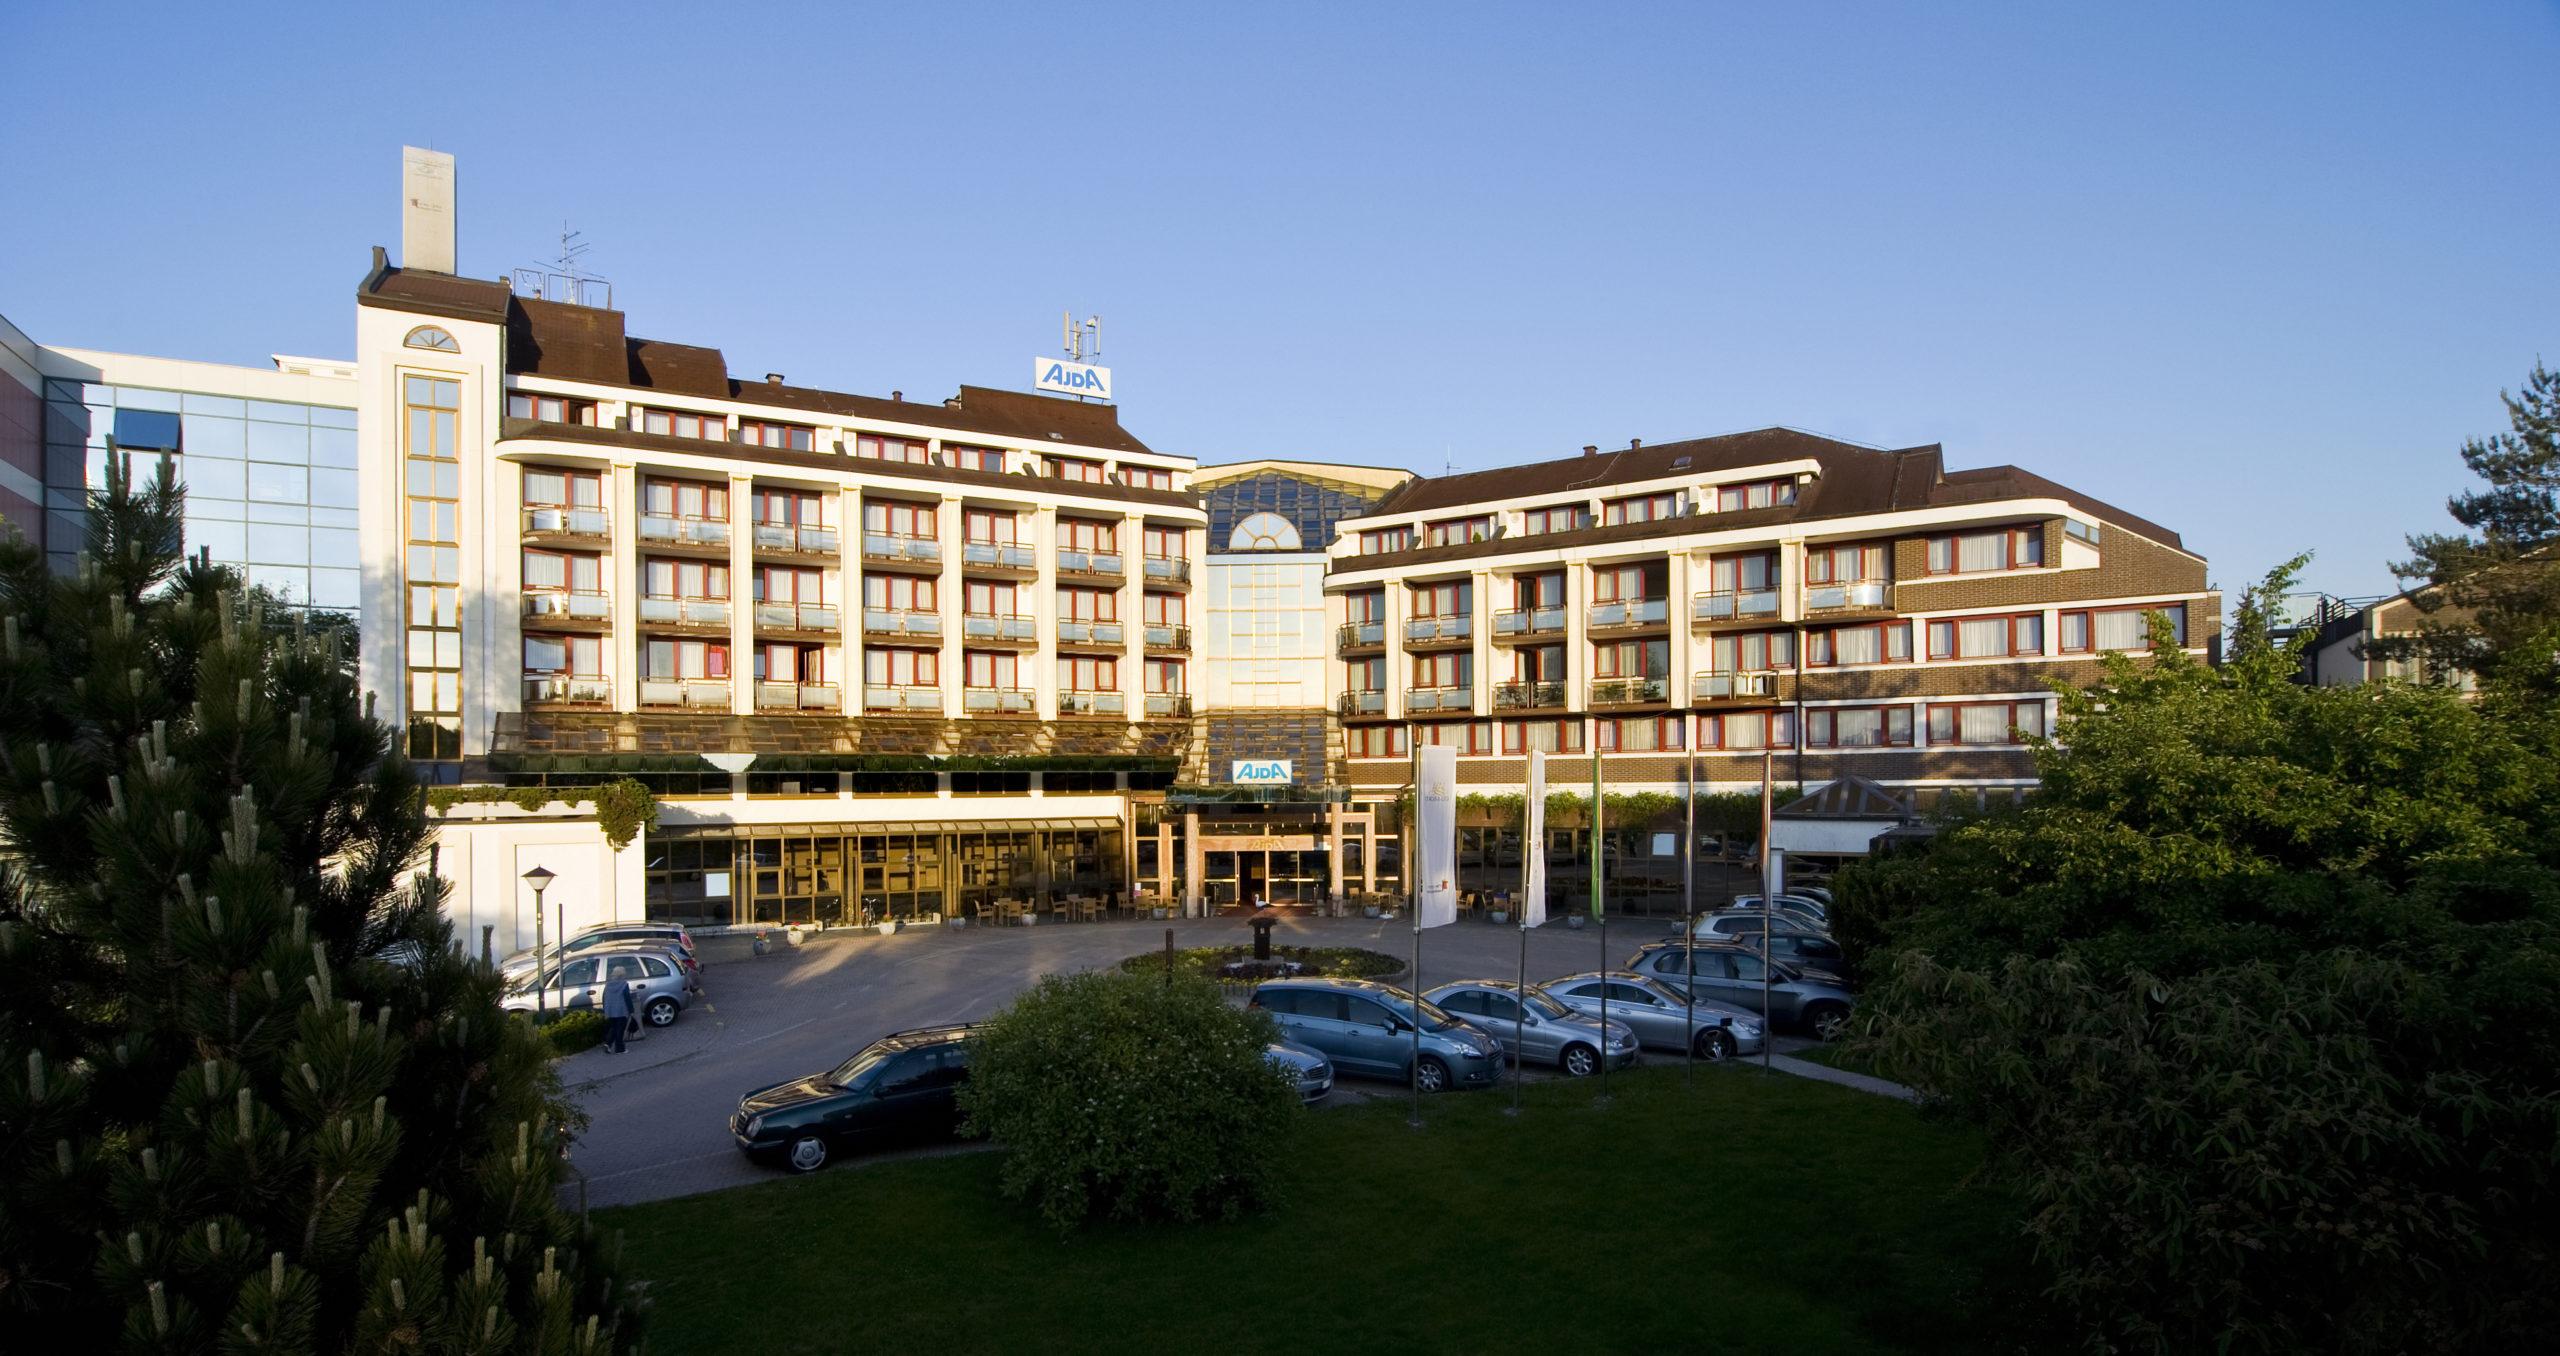 Hotel Ajda_06_T3000_Foto AC_05 11